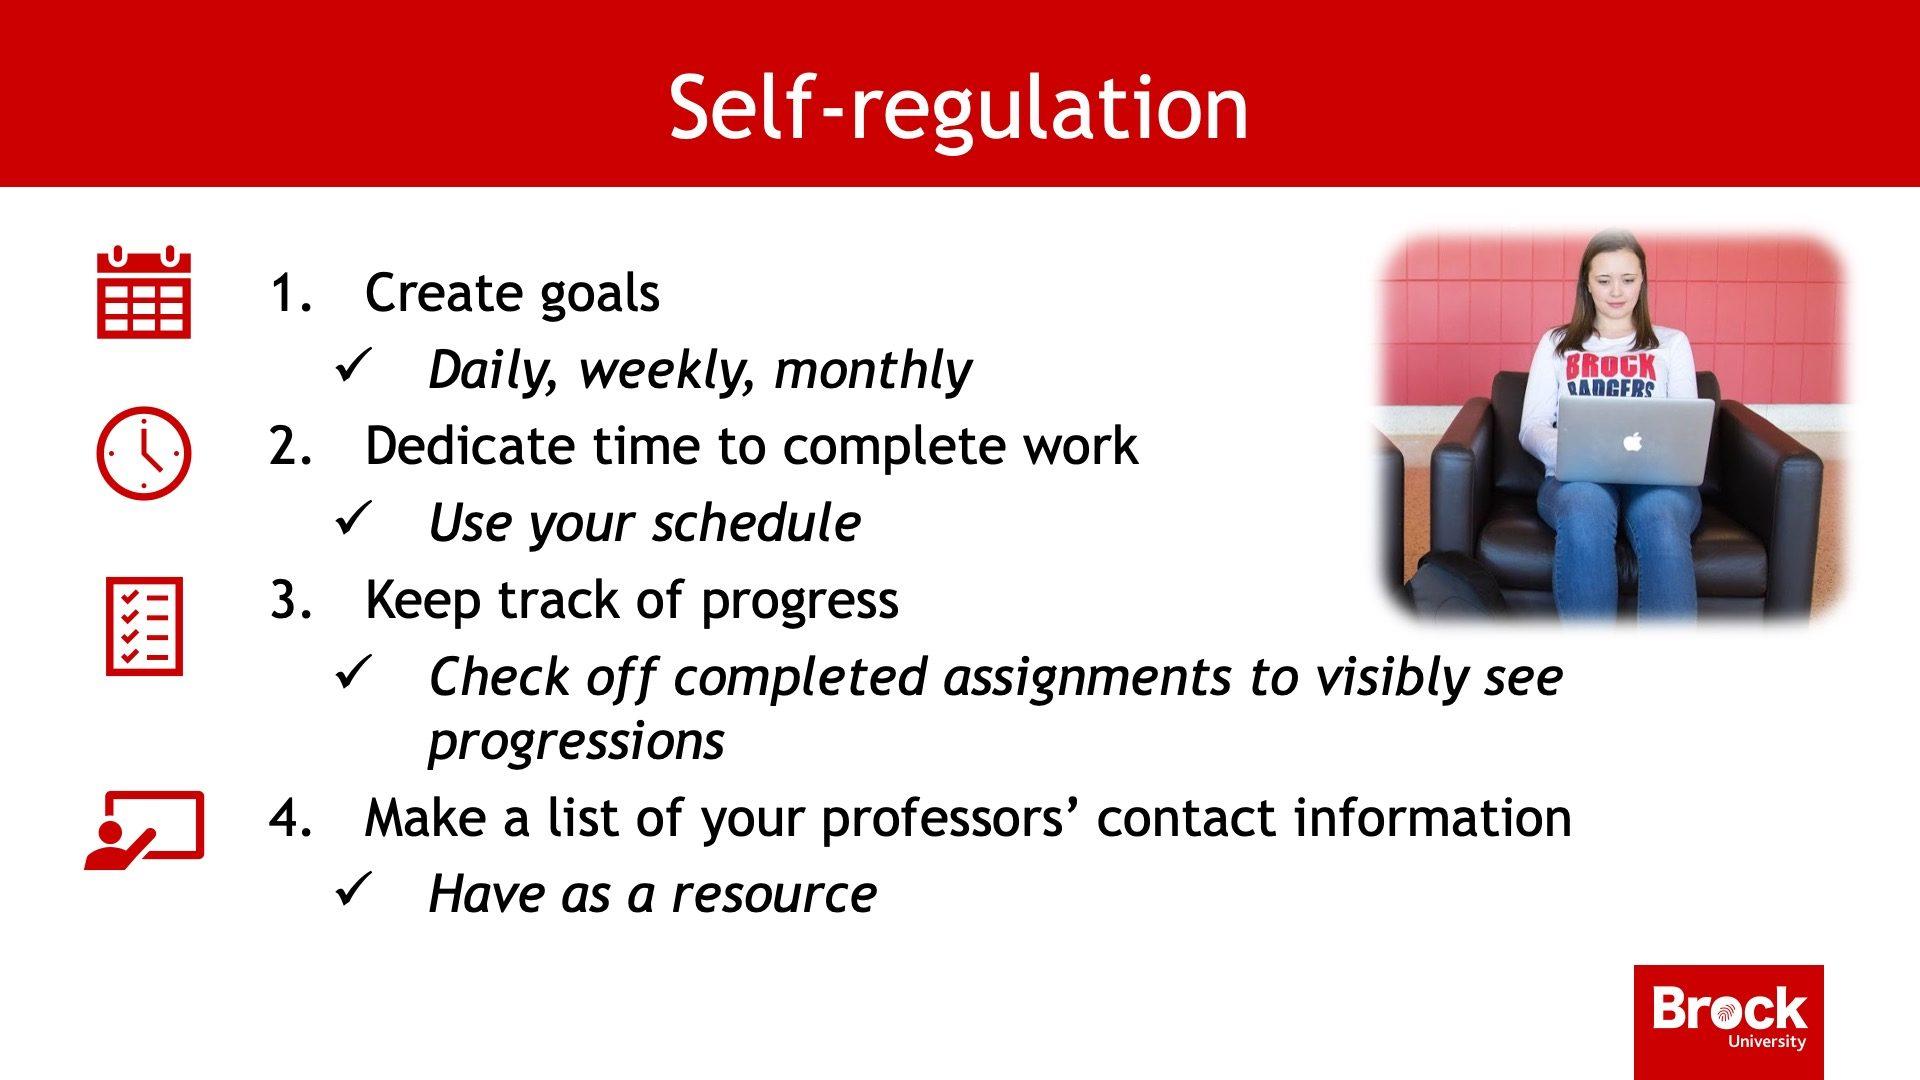 Self-regulation steps